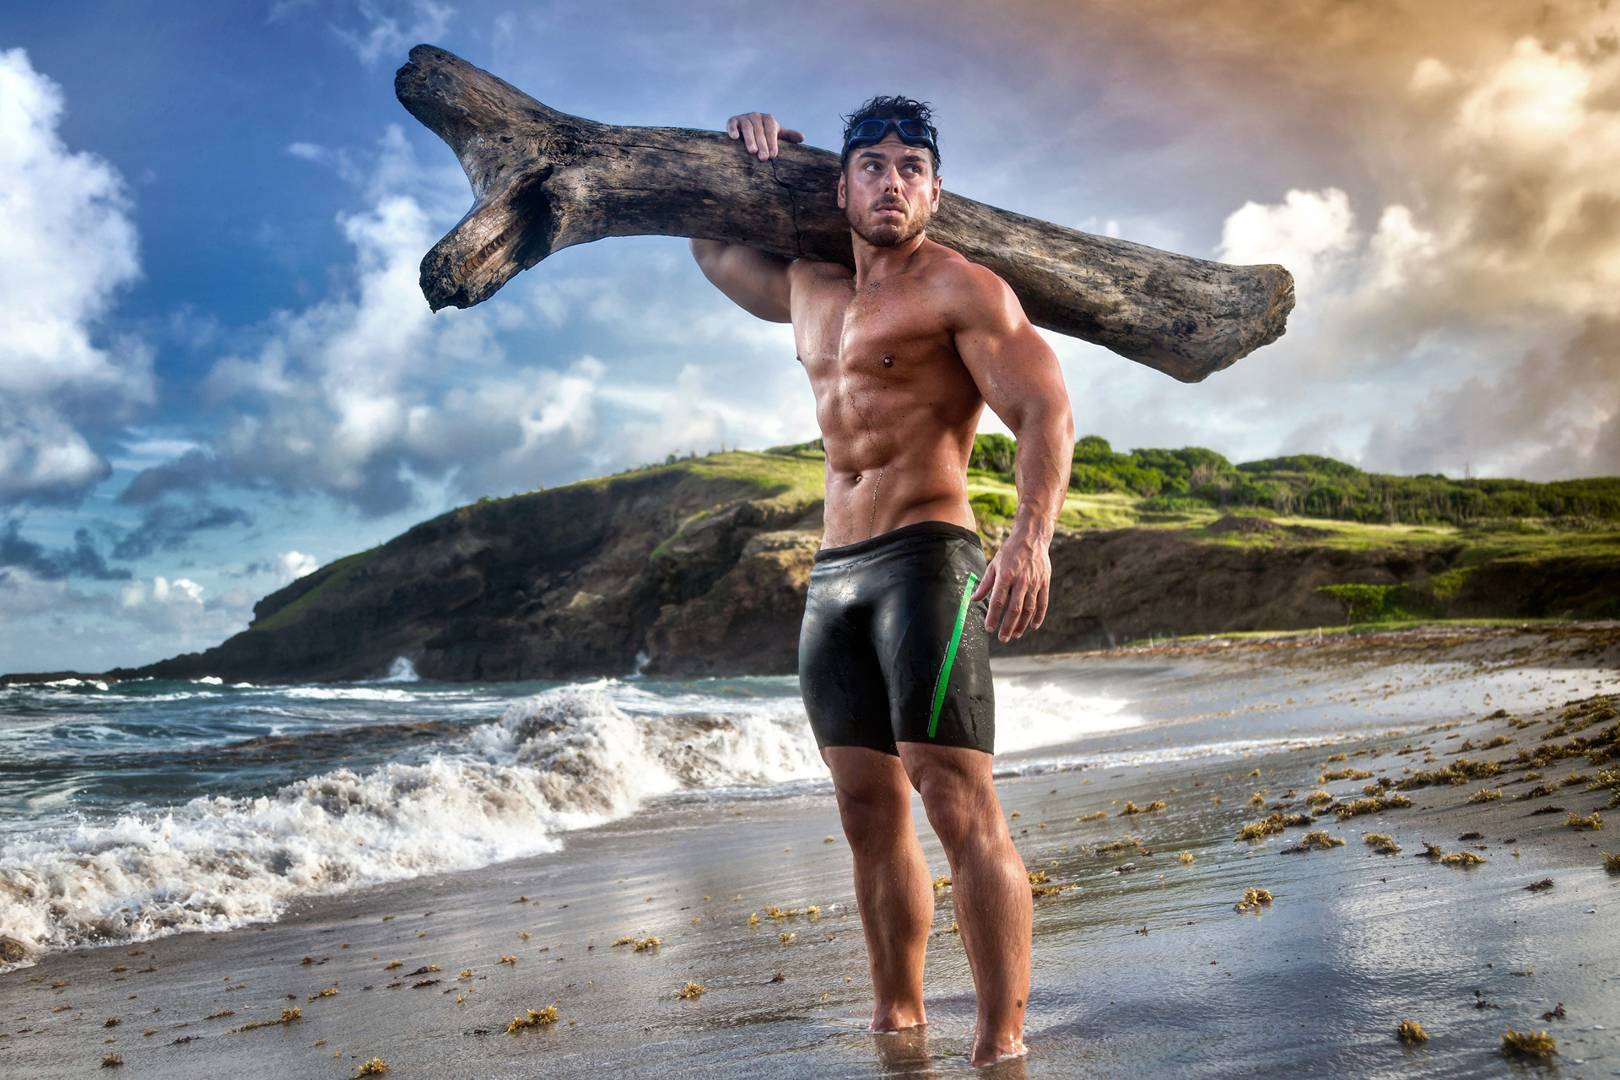 df74020c07 The real Aquaman's accidental world record | British GQ